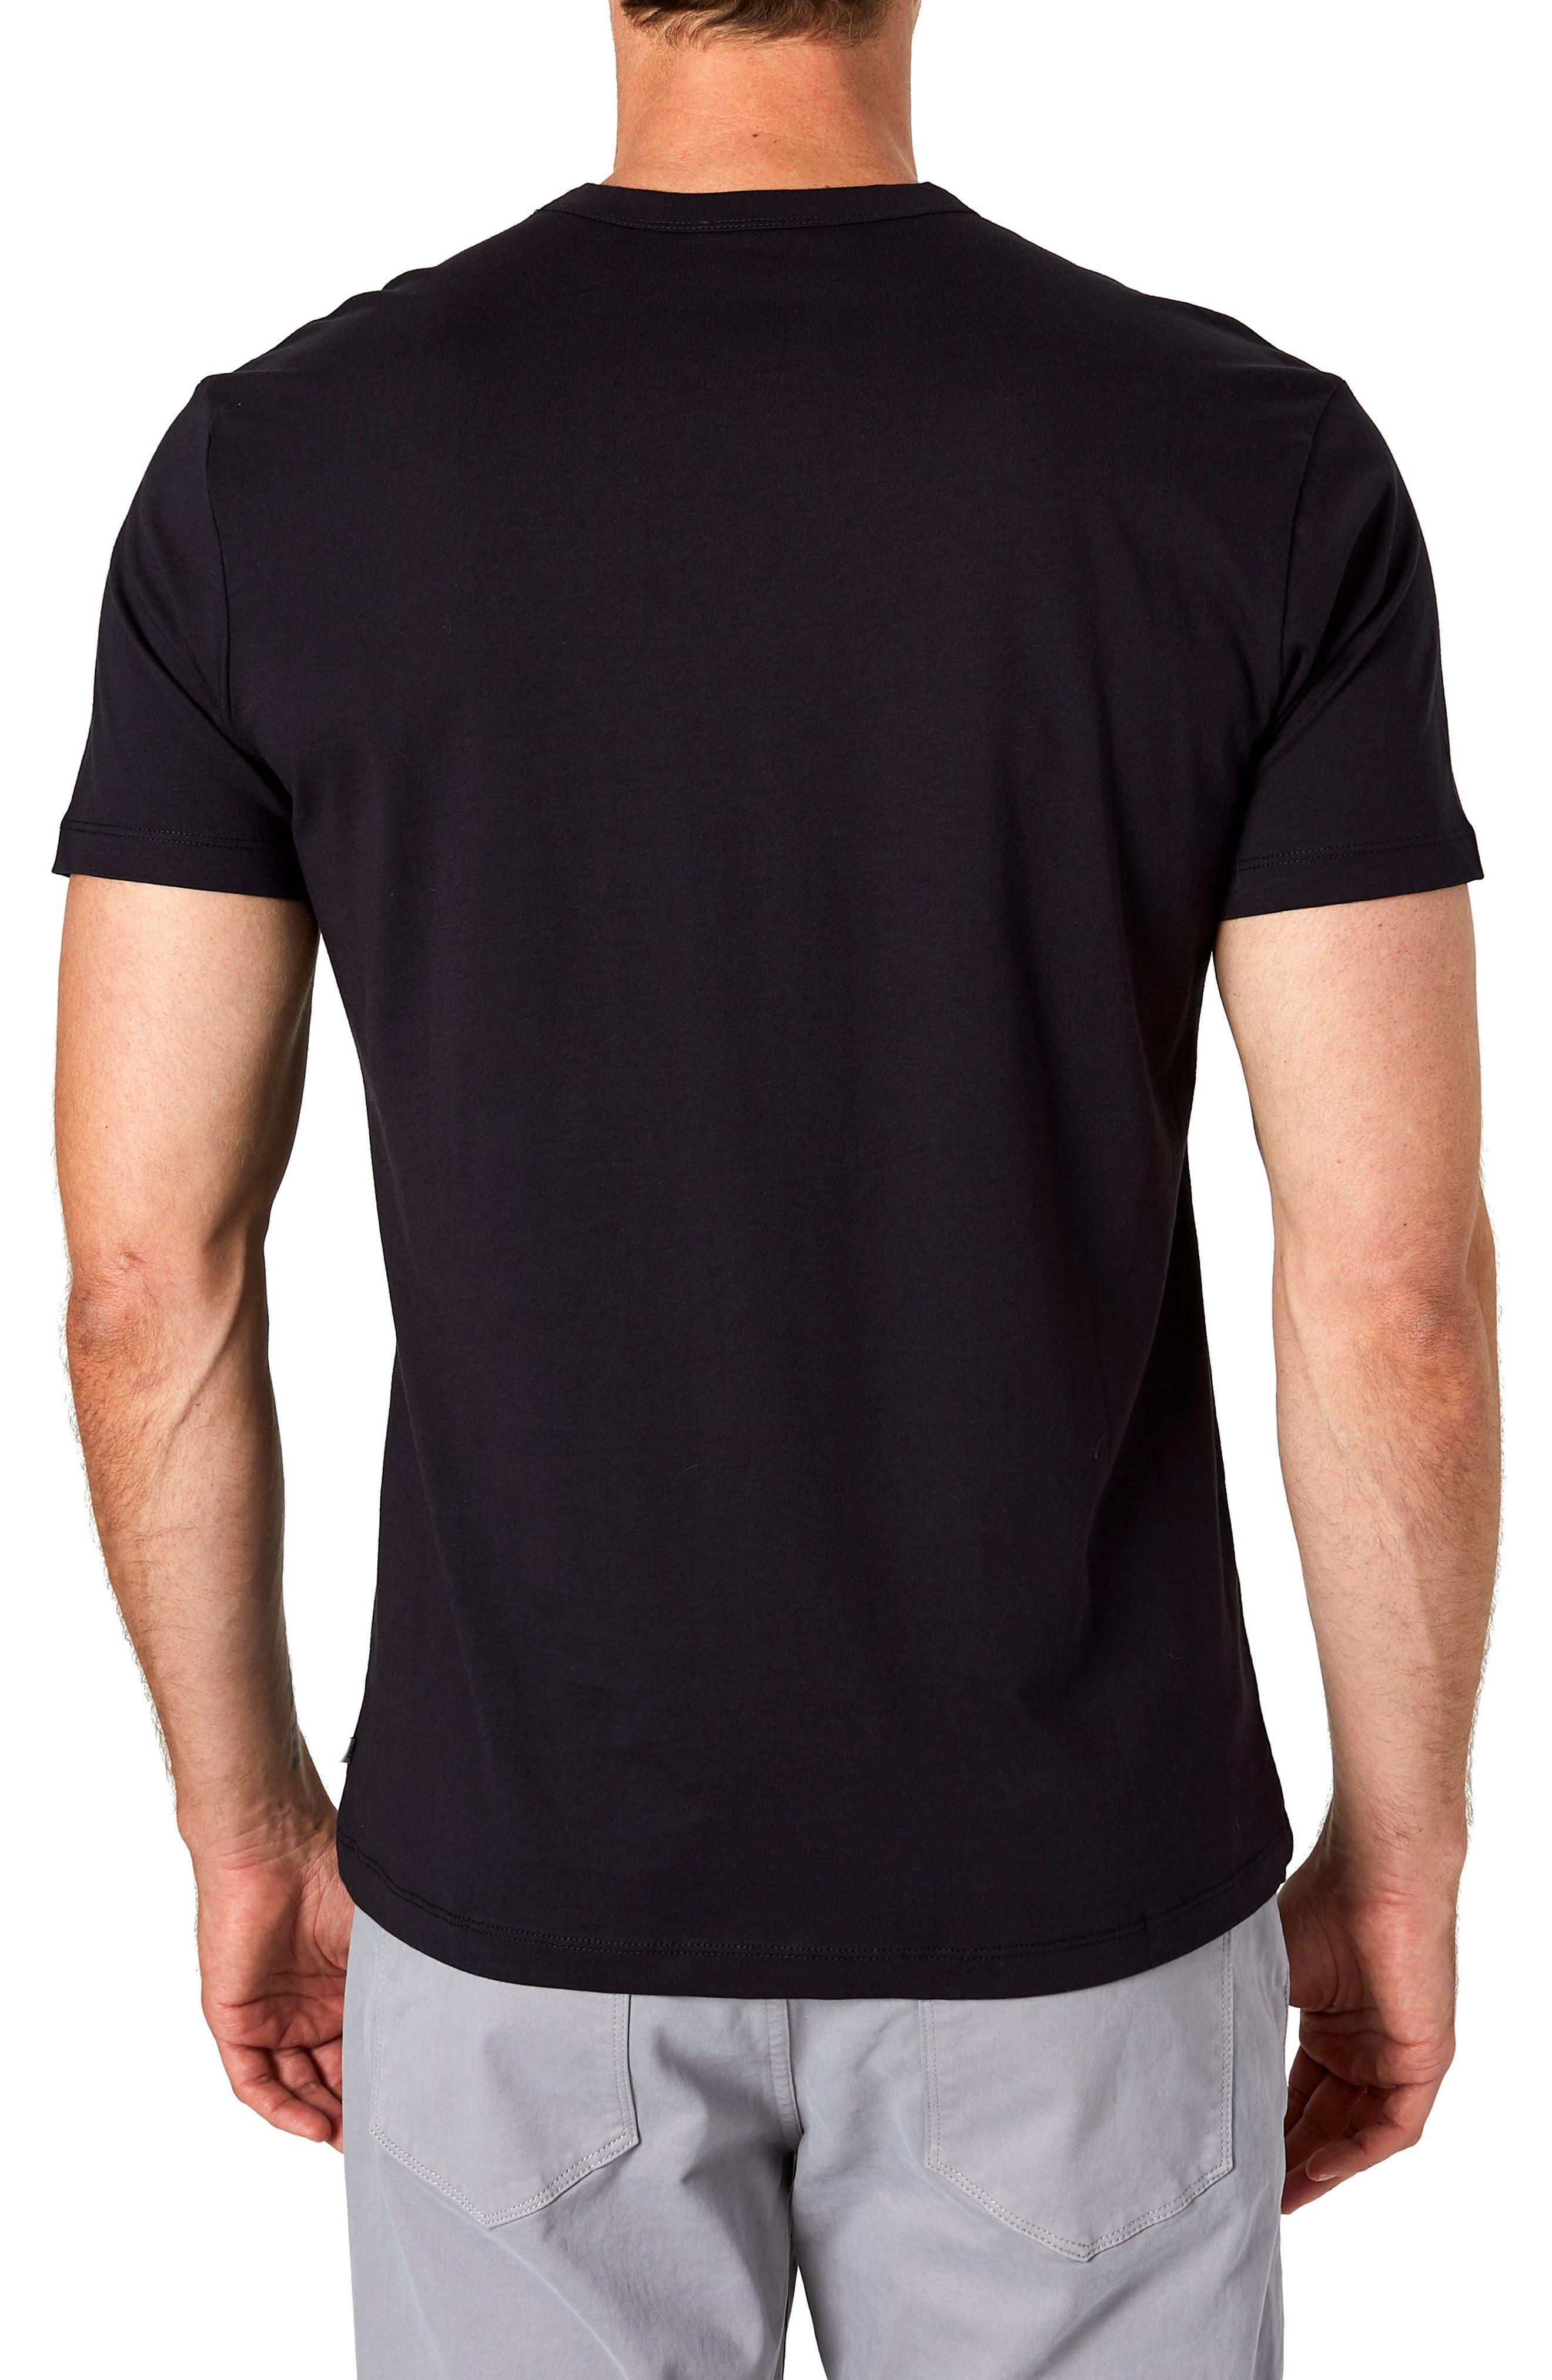 Iqonicq Crewneck T-Shirt,                             Alternate thumbnail 2, color,                             BLACK